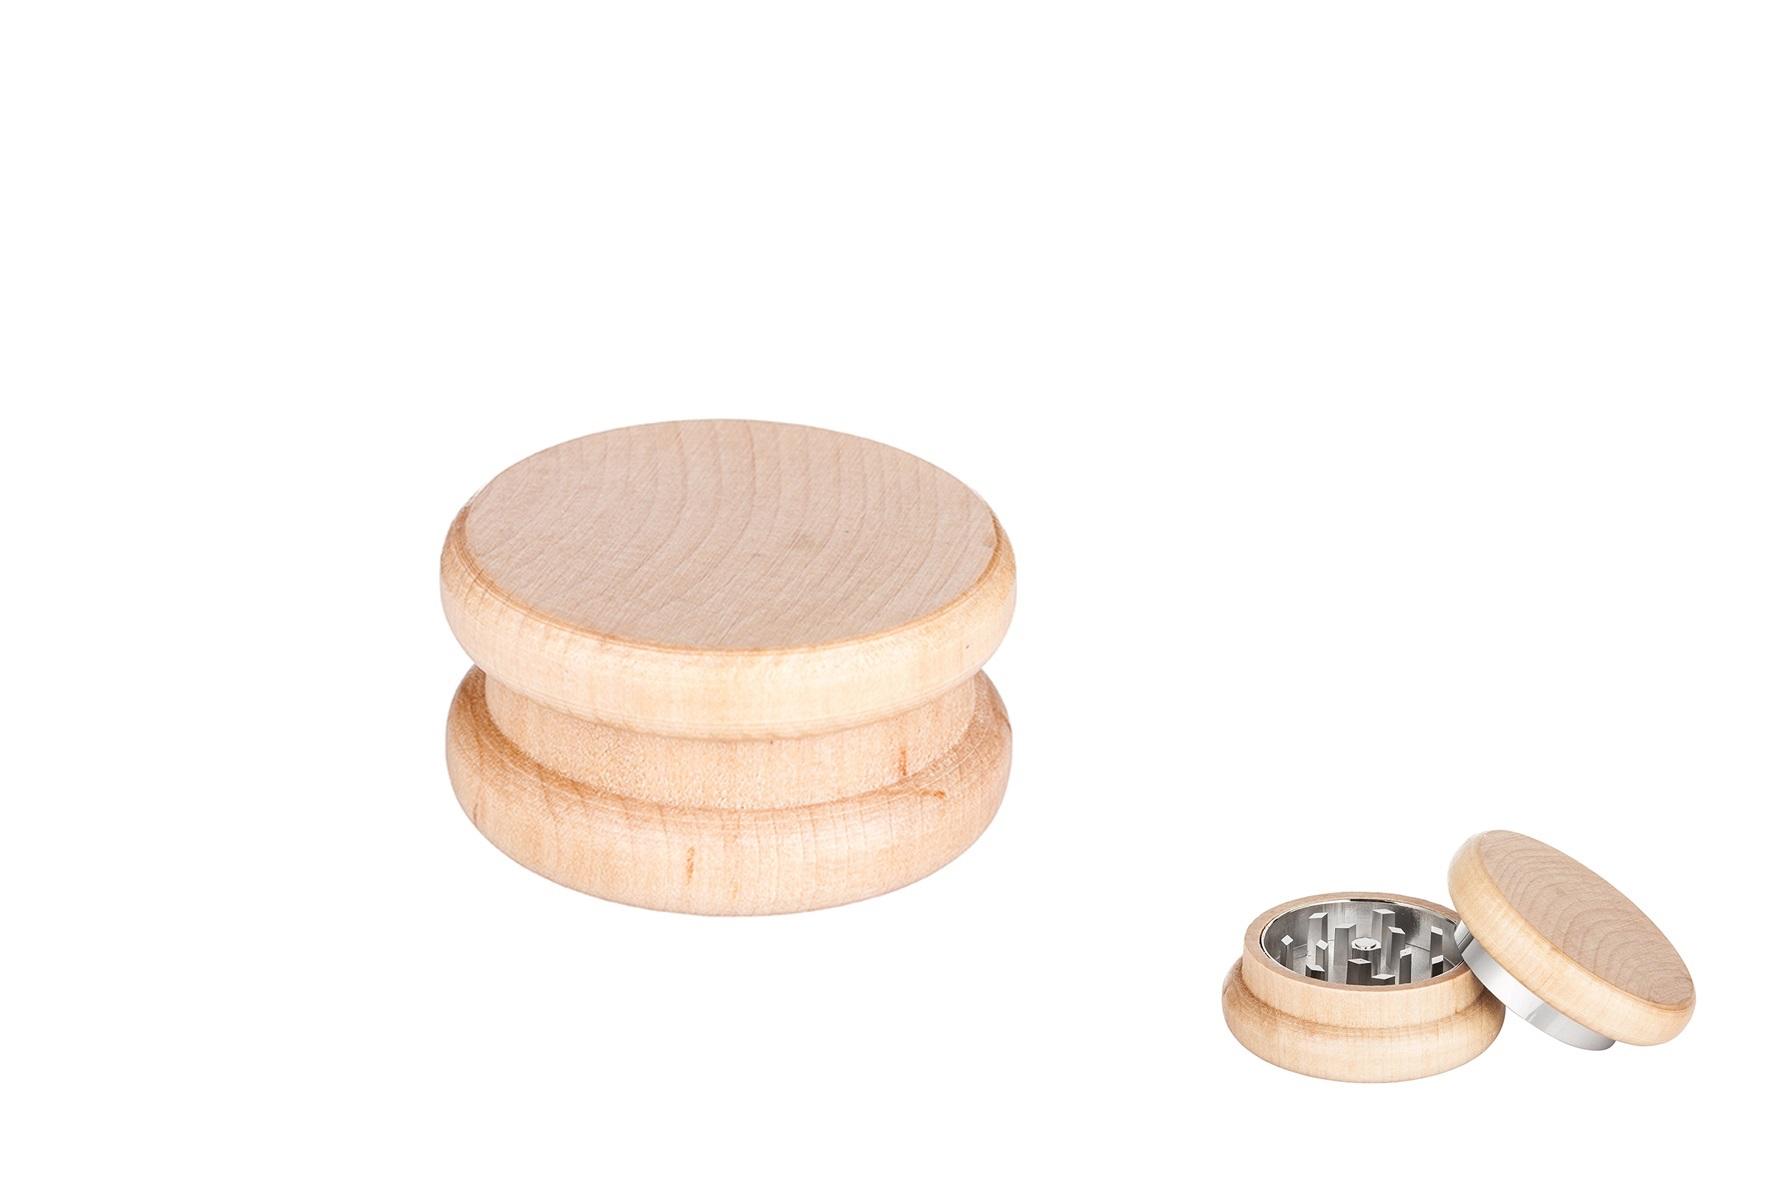 Goodvibe ~ Grinder wood 2-piece